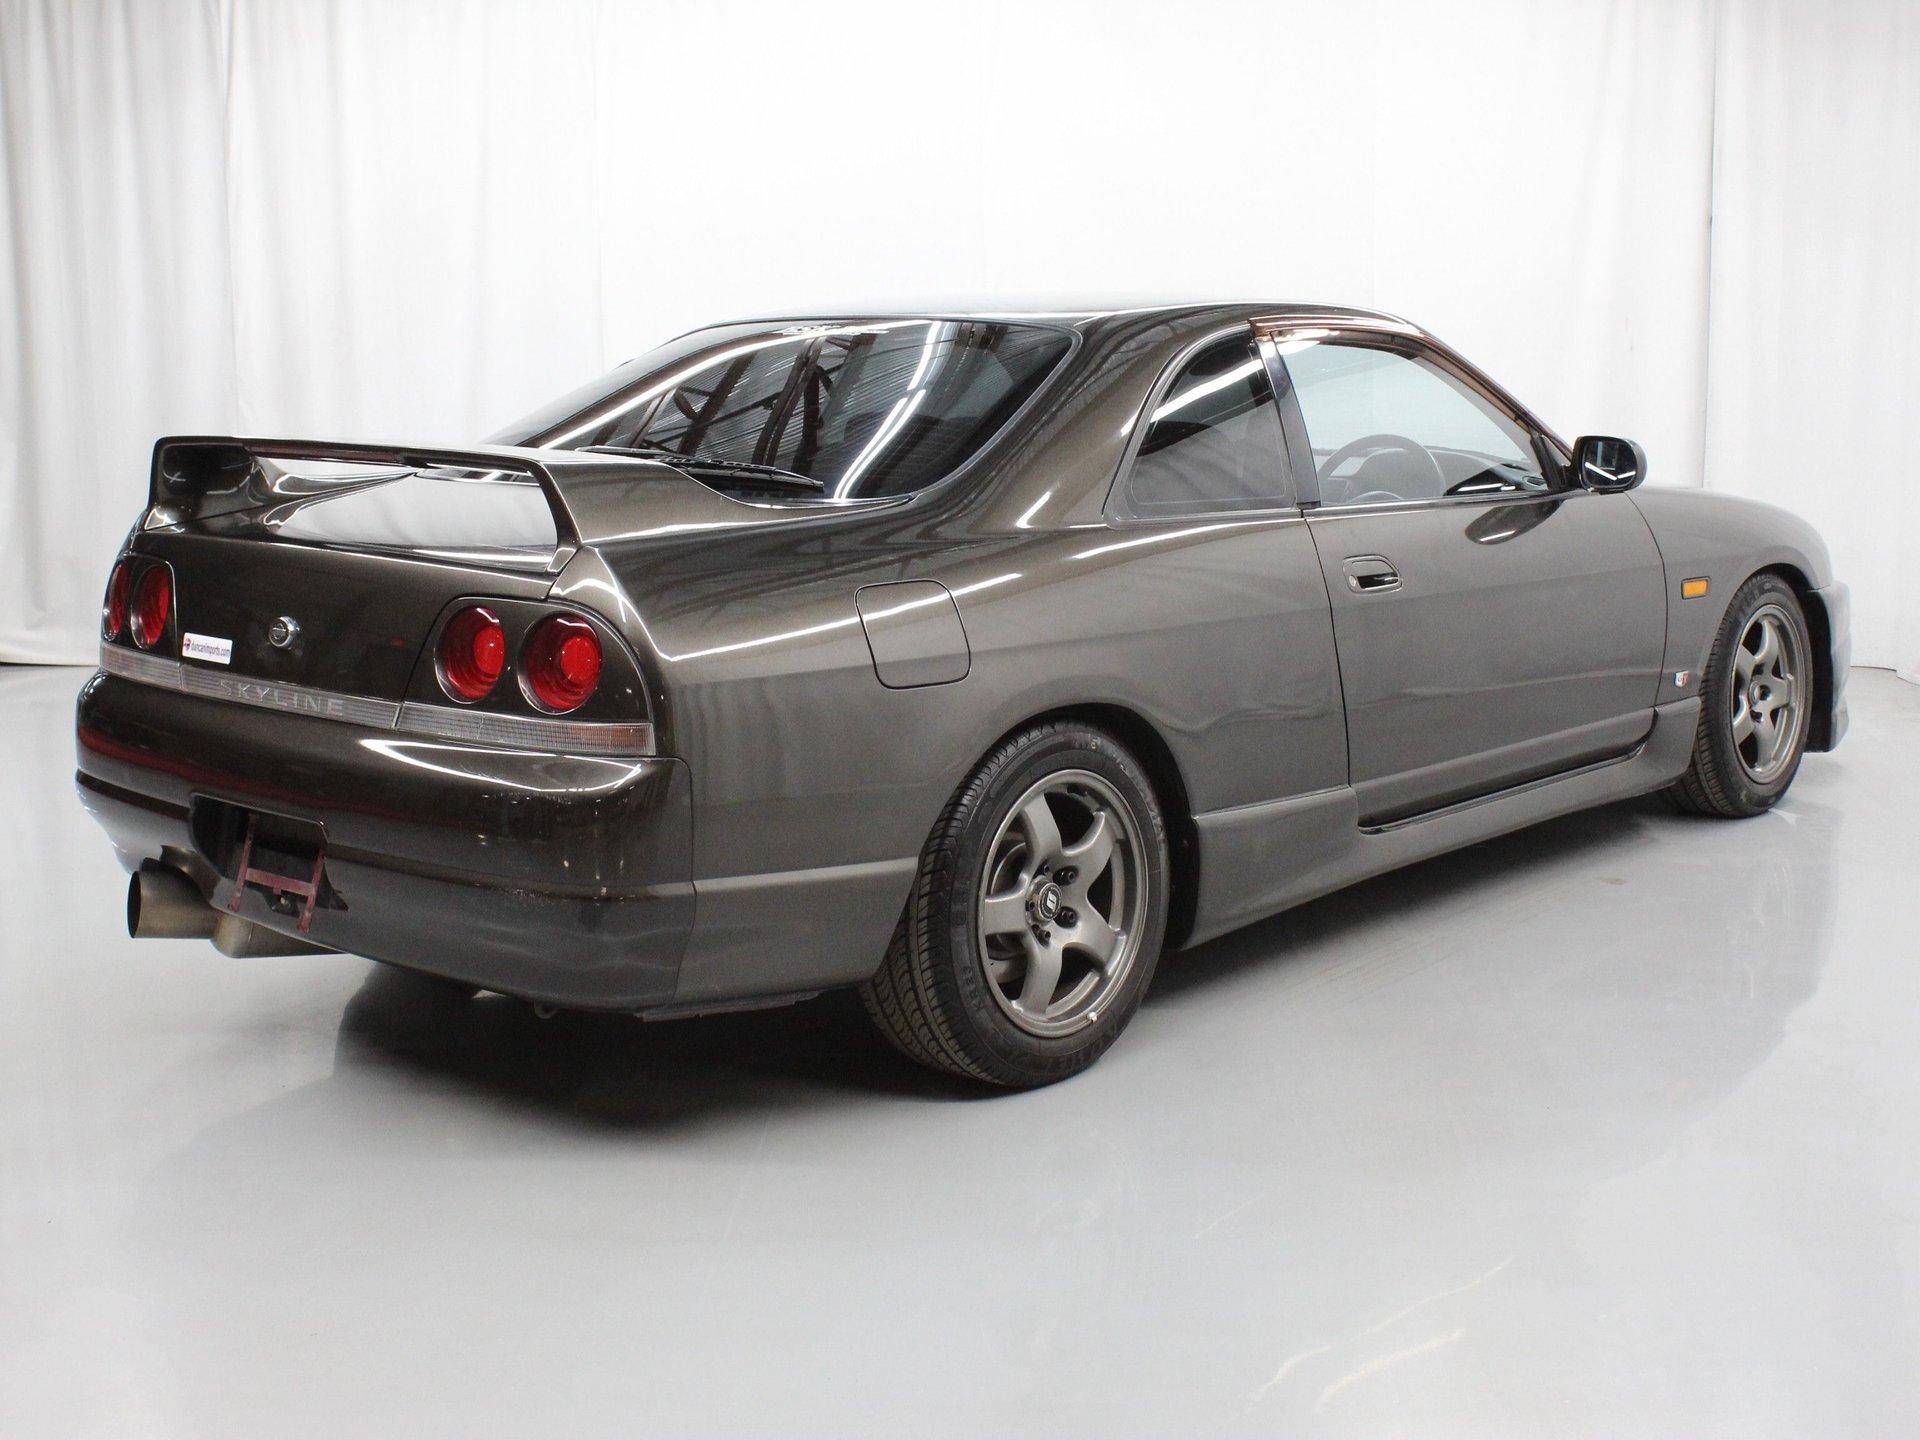 1994 Nissan Skyline